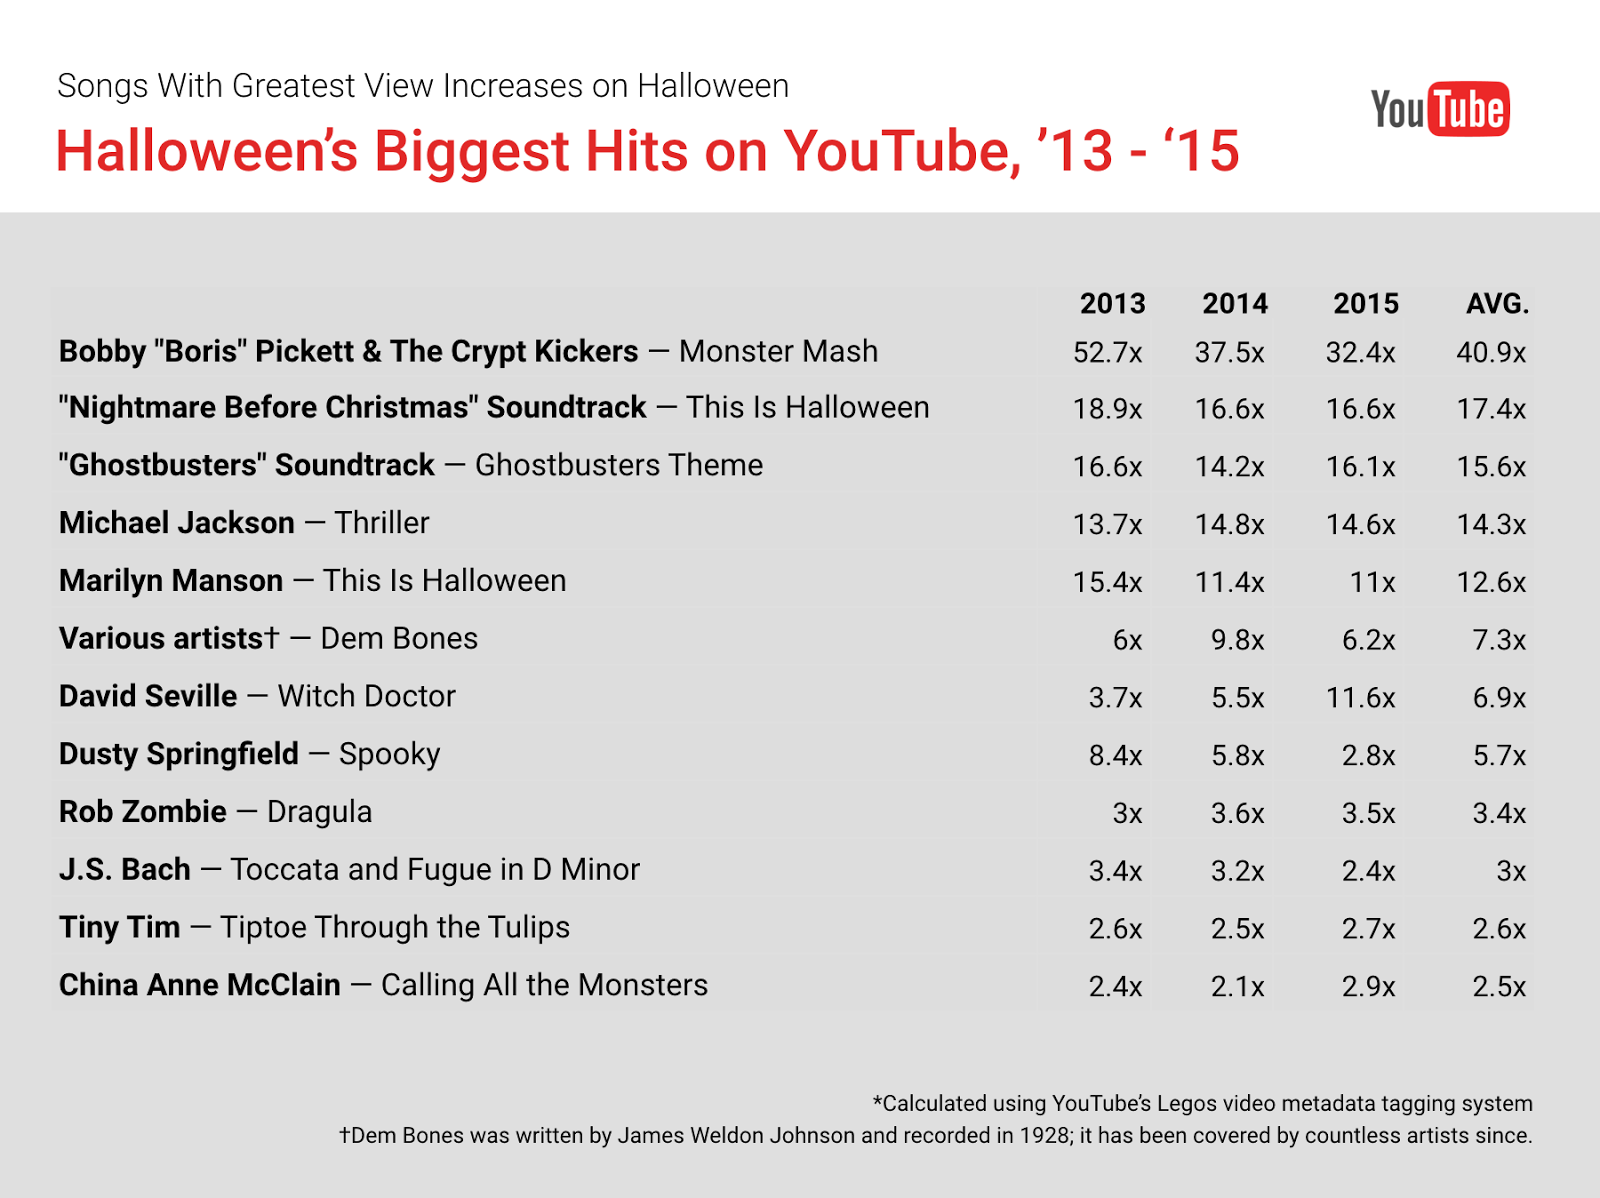 YouTube Trends: Halloween\'s Biggest Hits